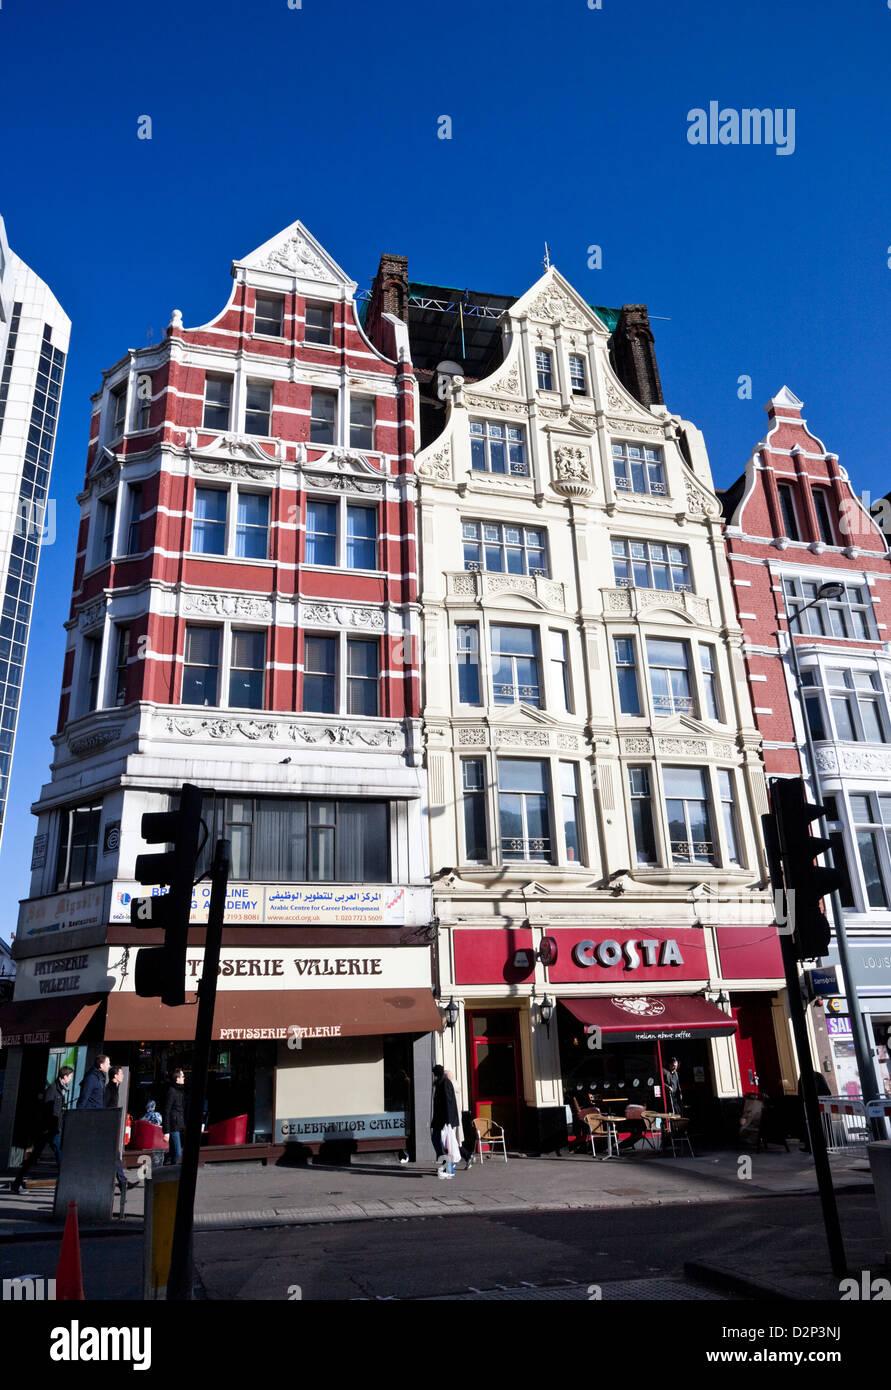 Tall houses on Edgware Road at Paddington, London, England, UK - Stock Image